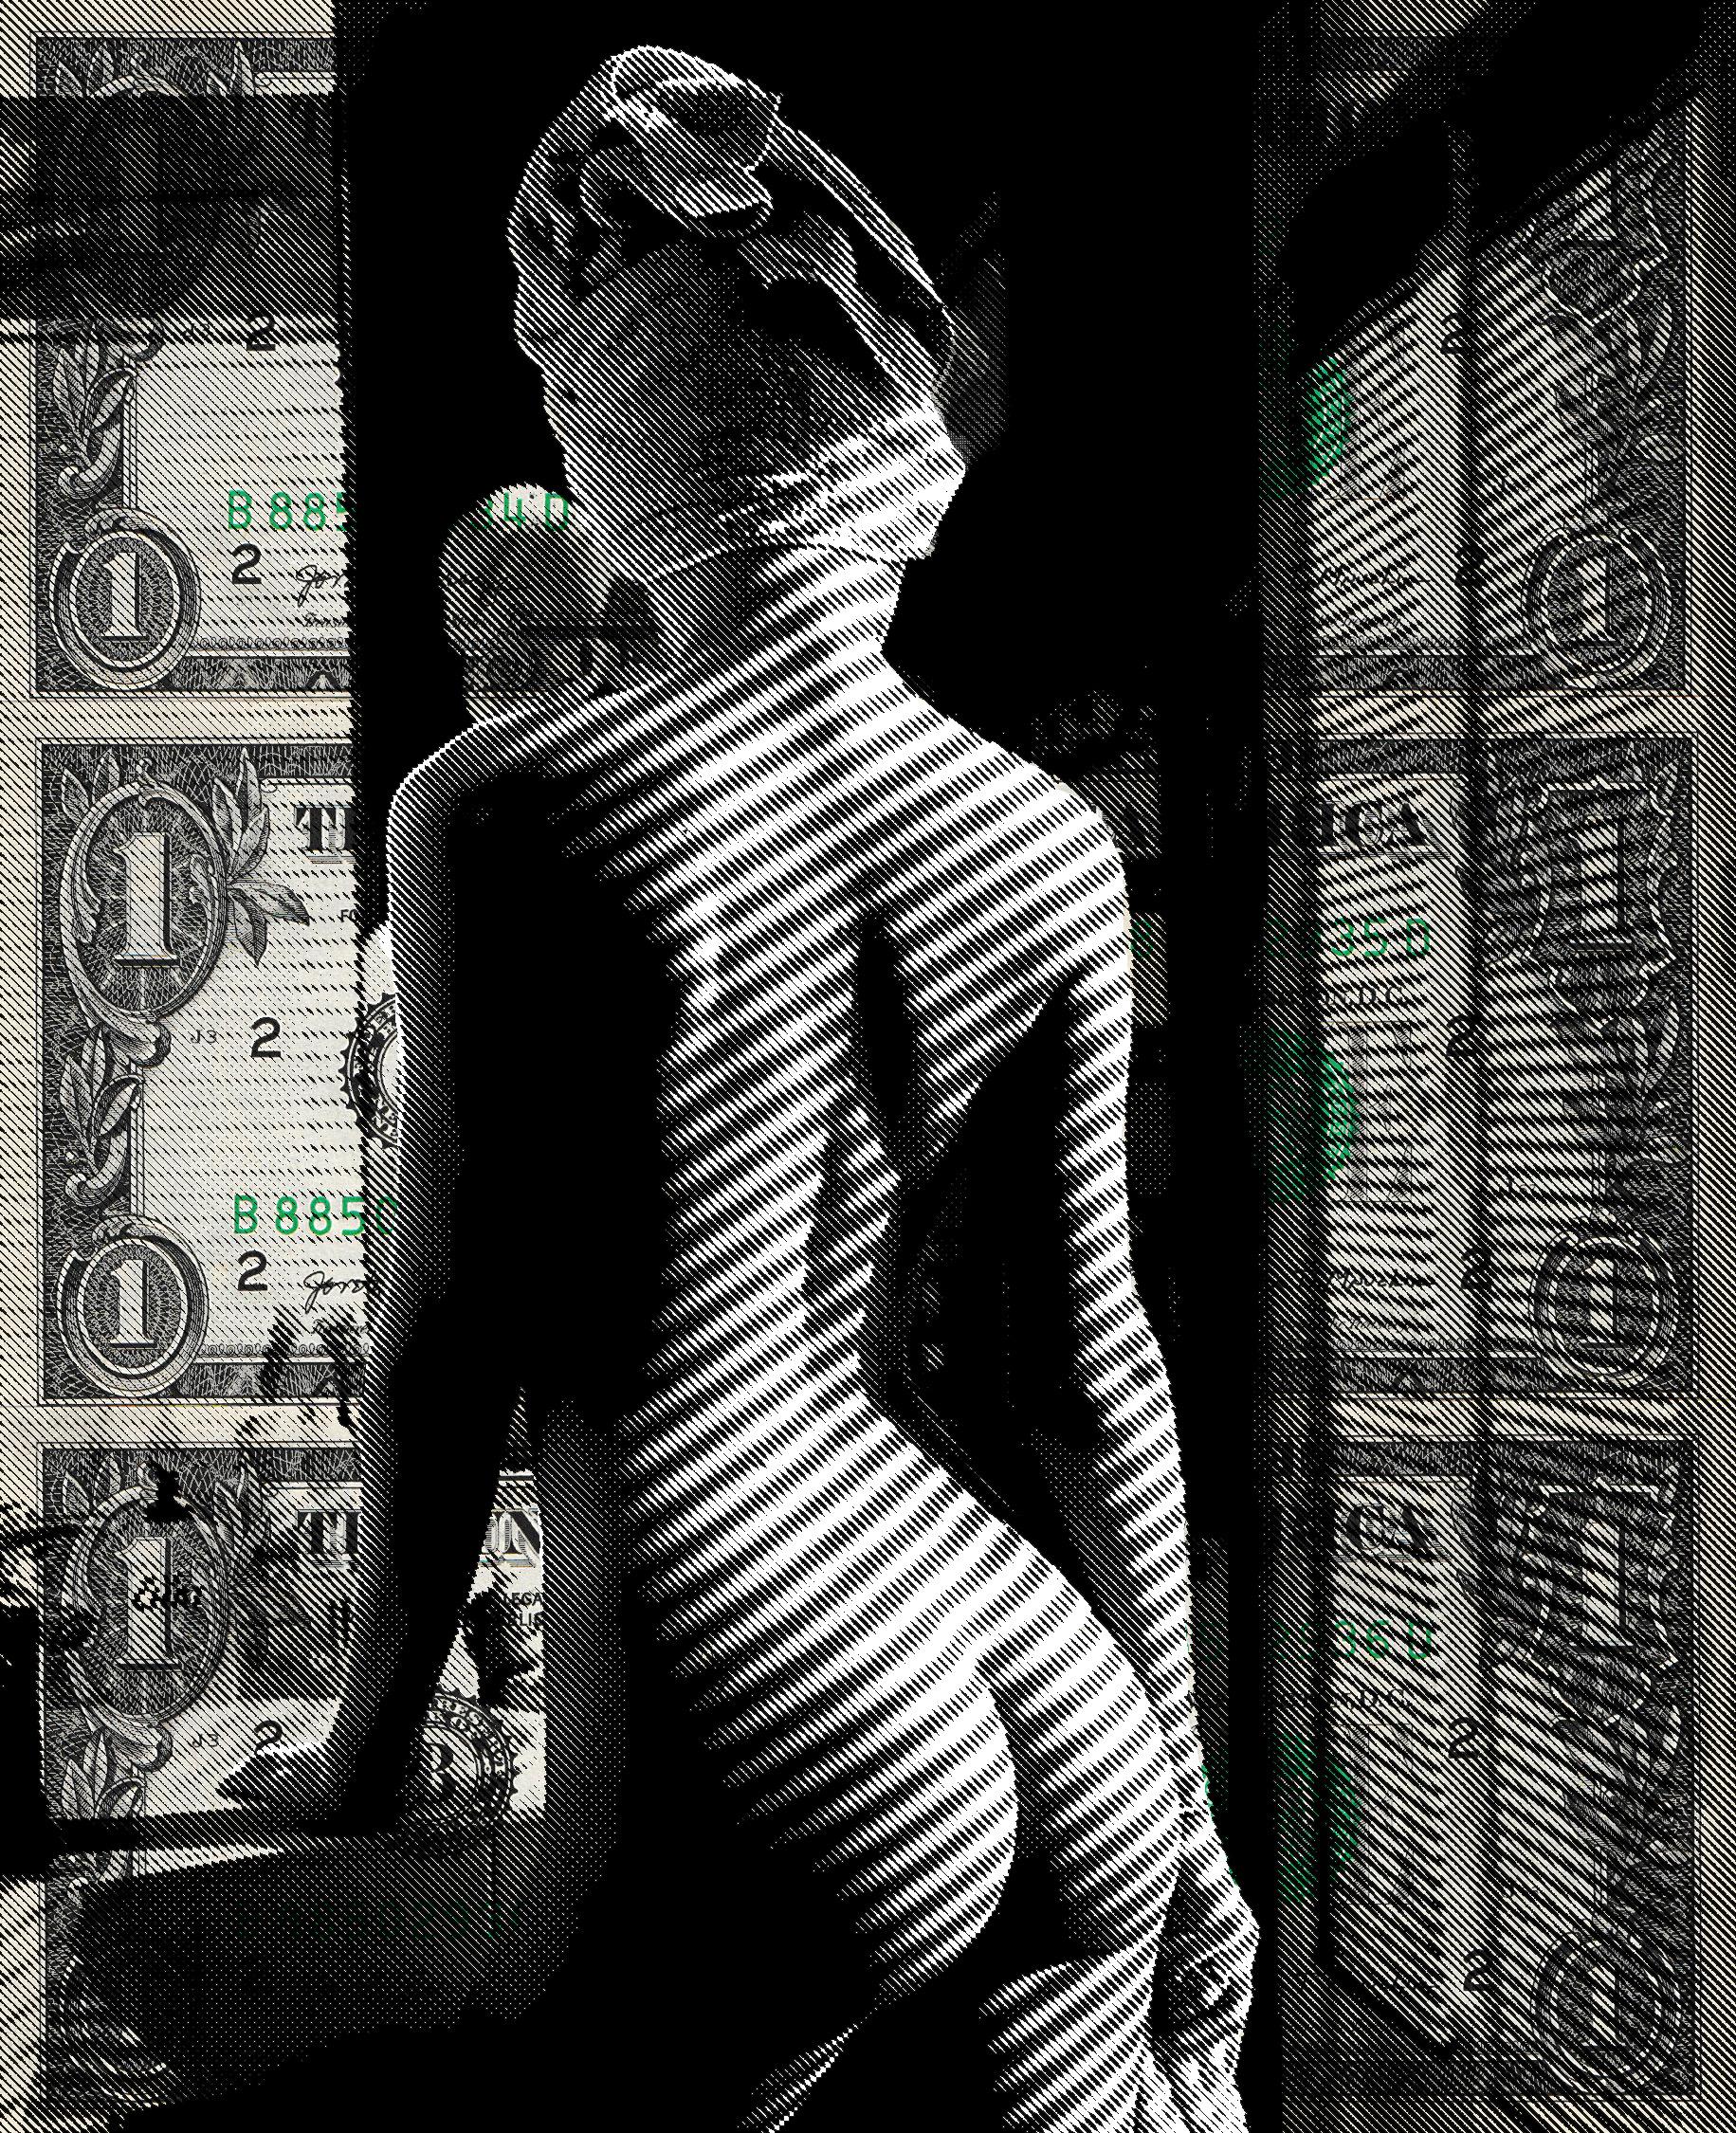 CHRISTOPHER HENRY ' SOIR D'ETE ' - 2020 - Image 6 of 7